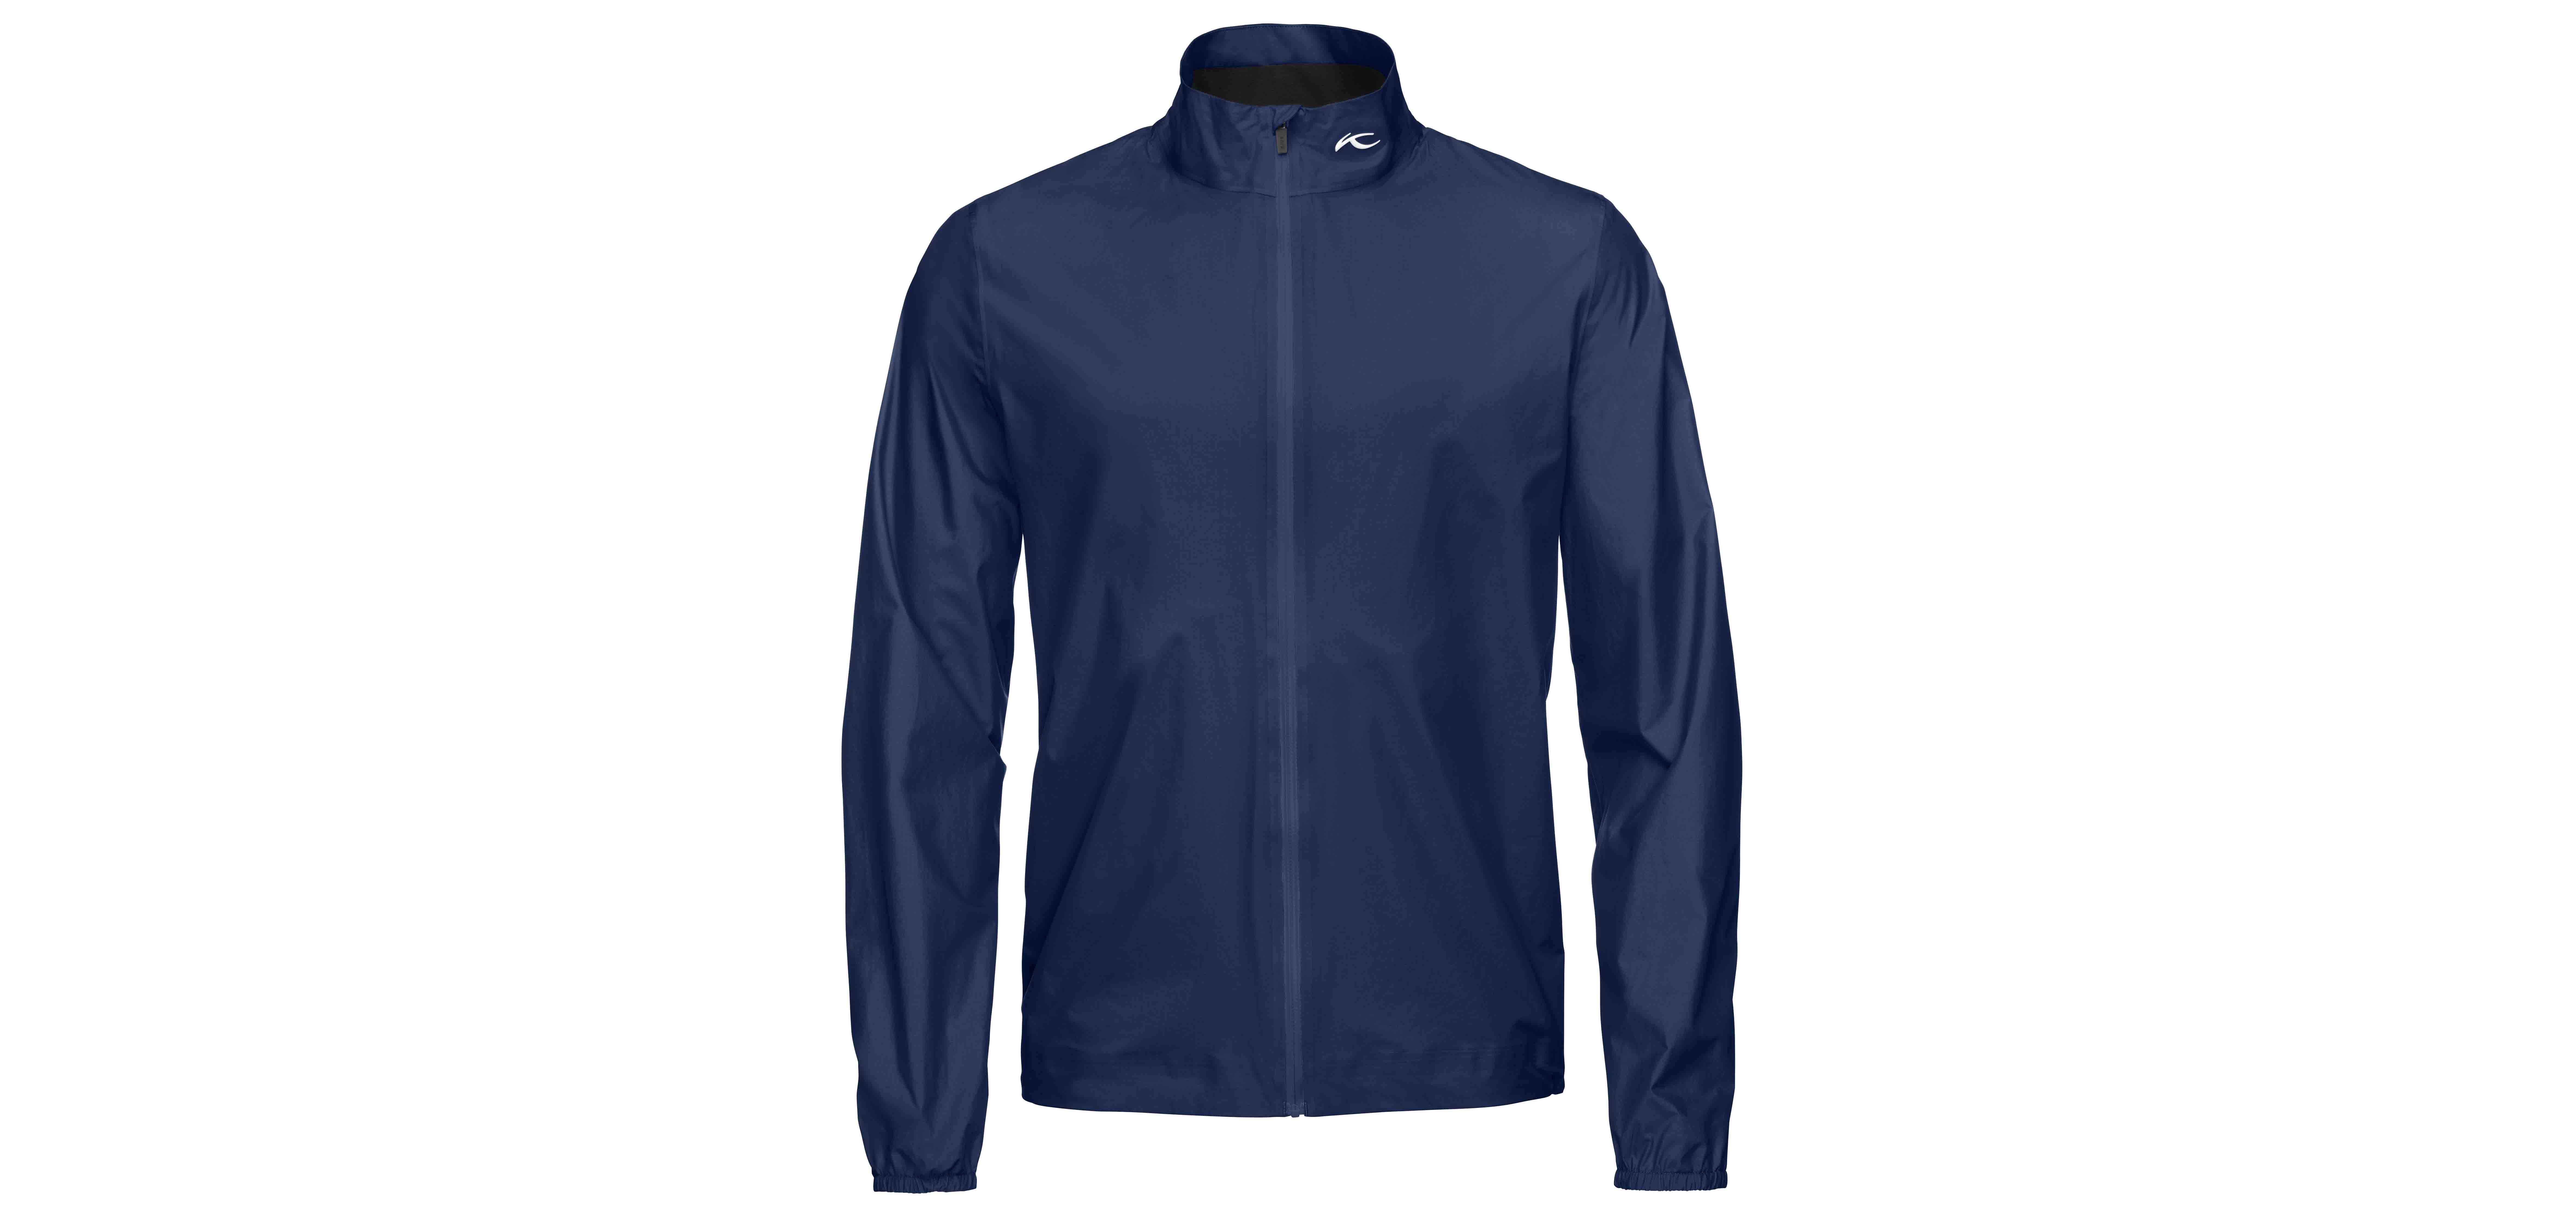 Kjus Dexter jacket review